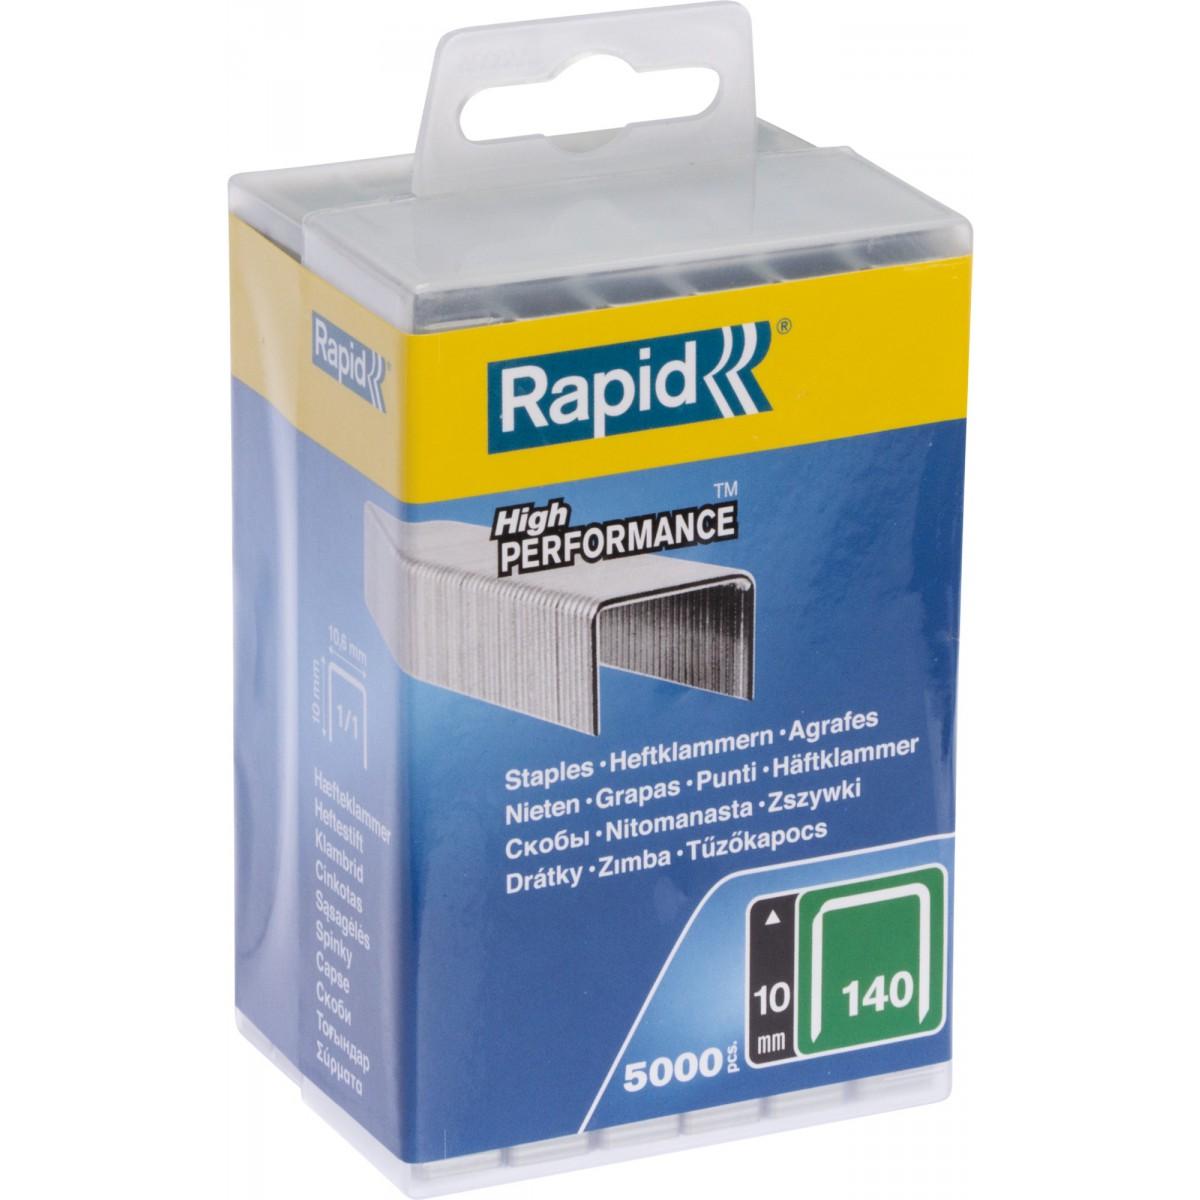 Agrafe n°140 Rapid Agraf - Hauteur 10 mm - 5000 agrafes